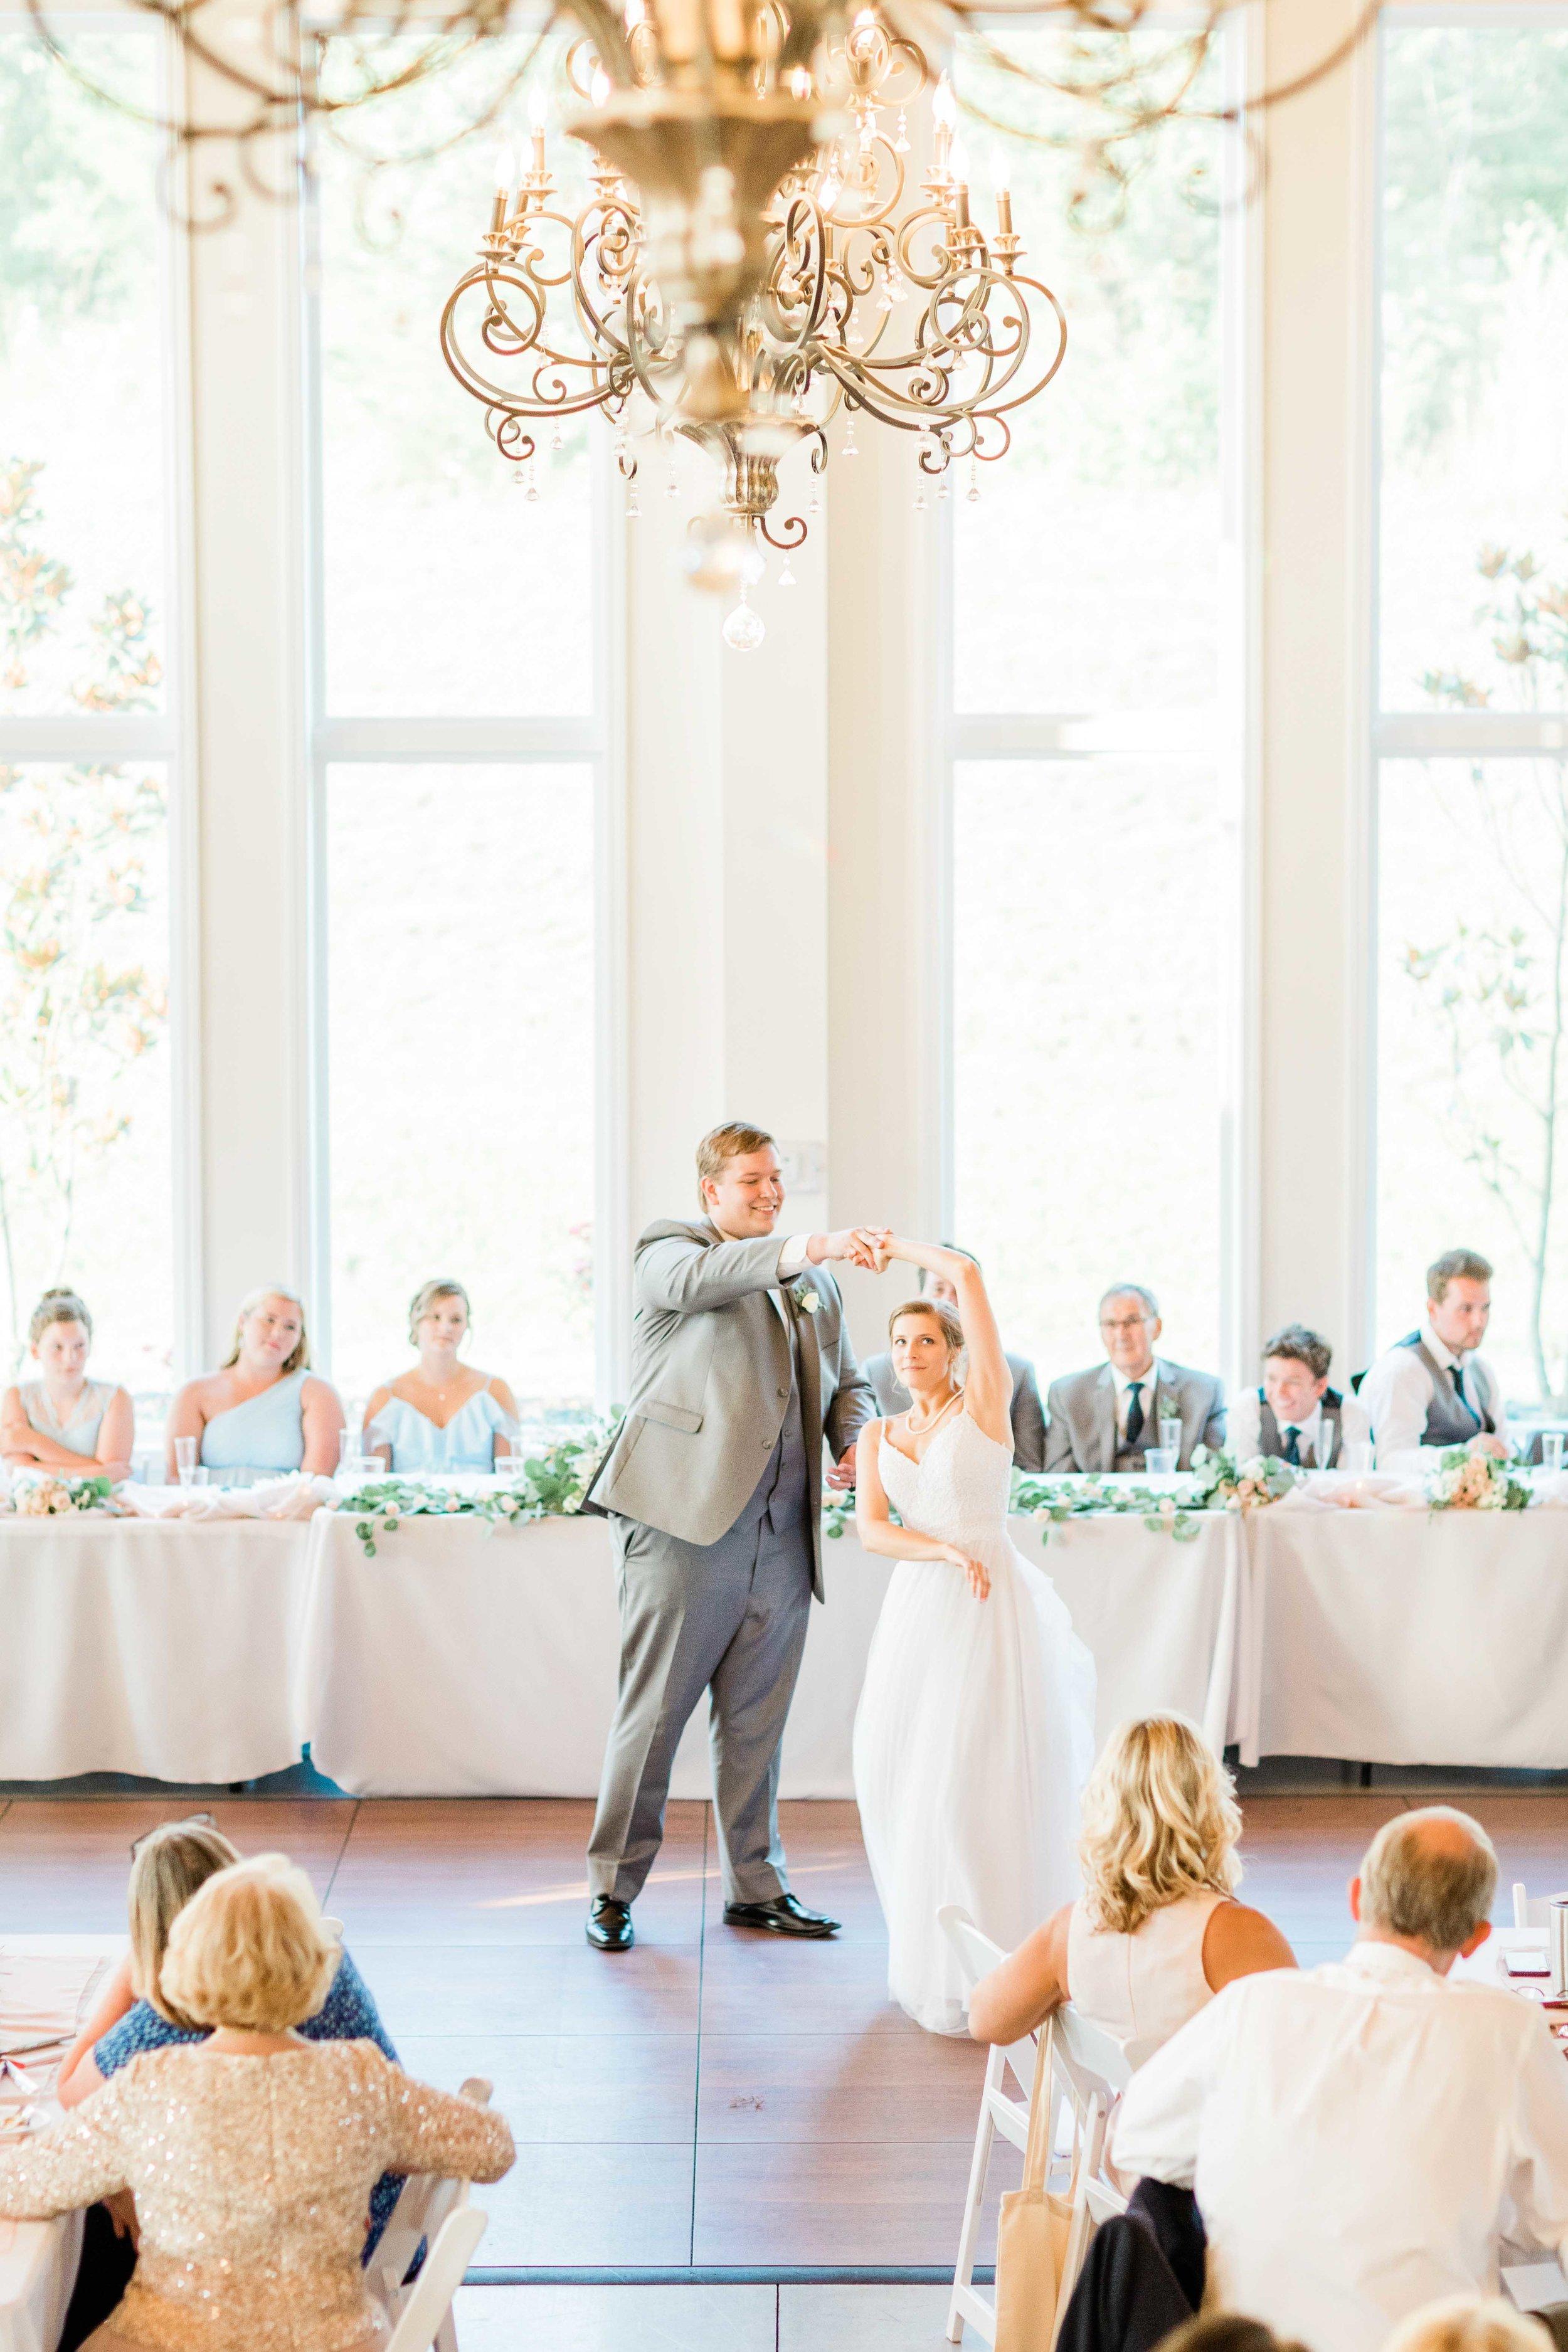 rosewood manor miamisburg wedding photos-9.jpg